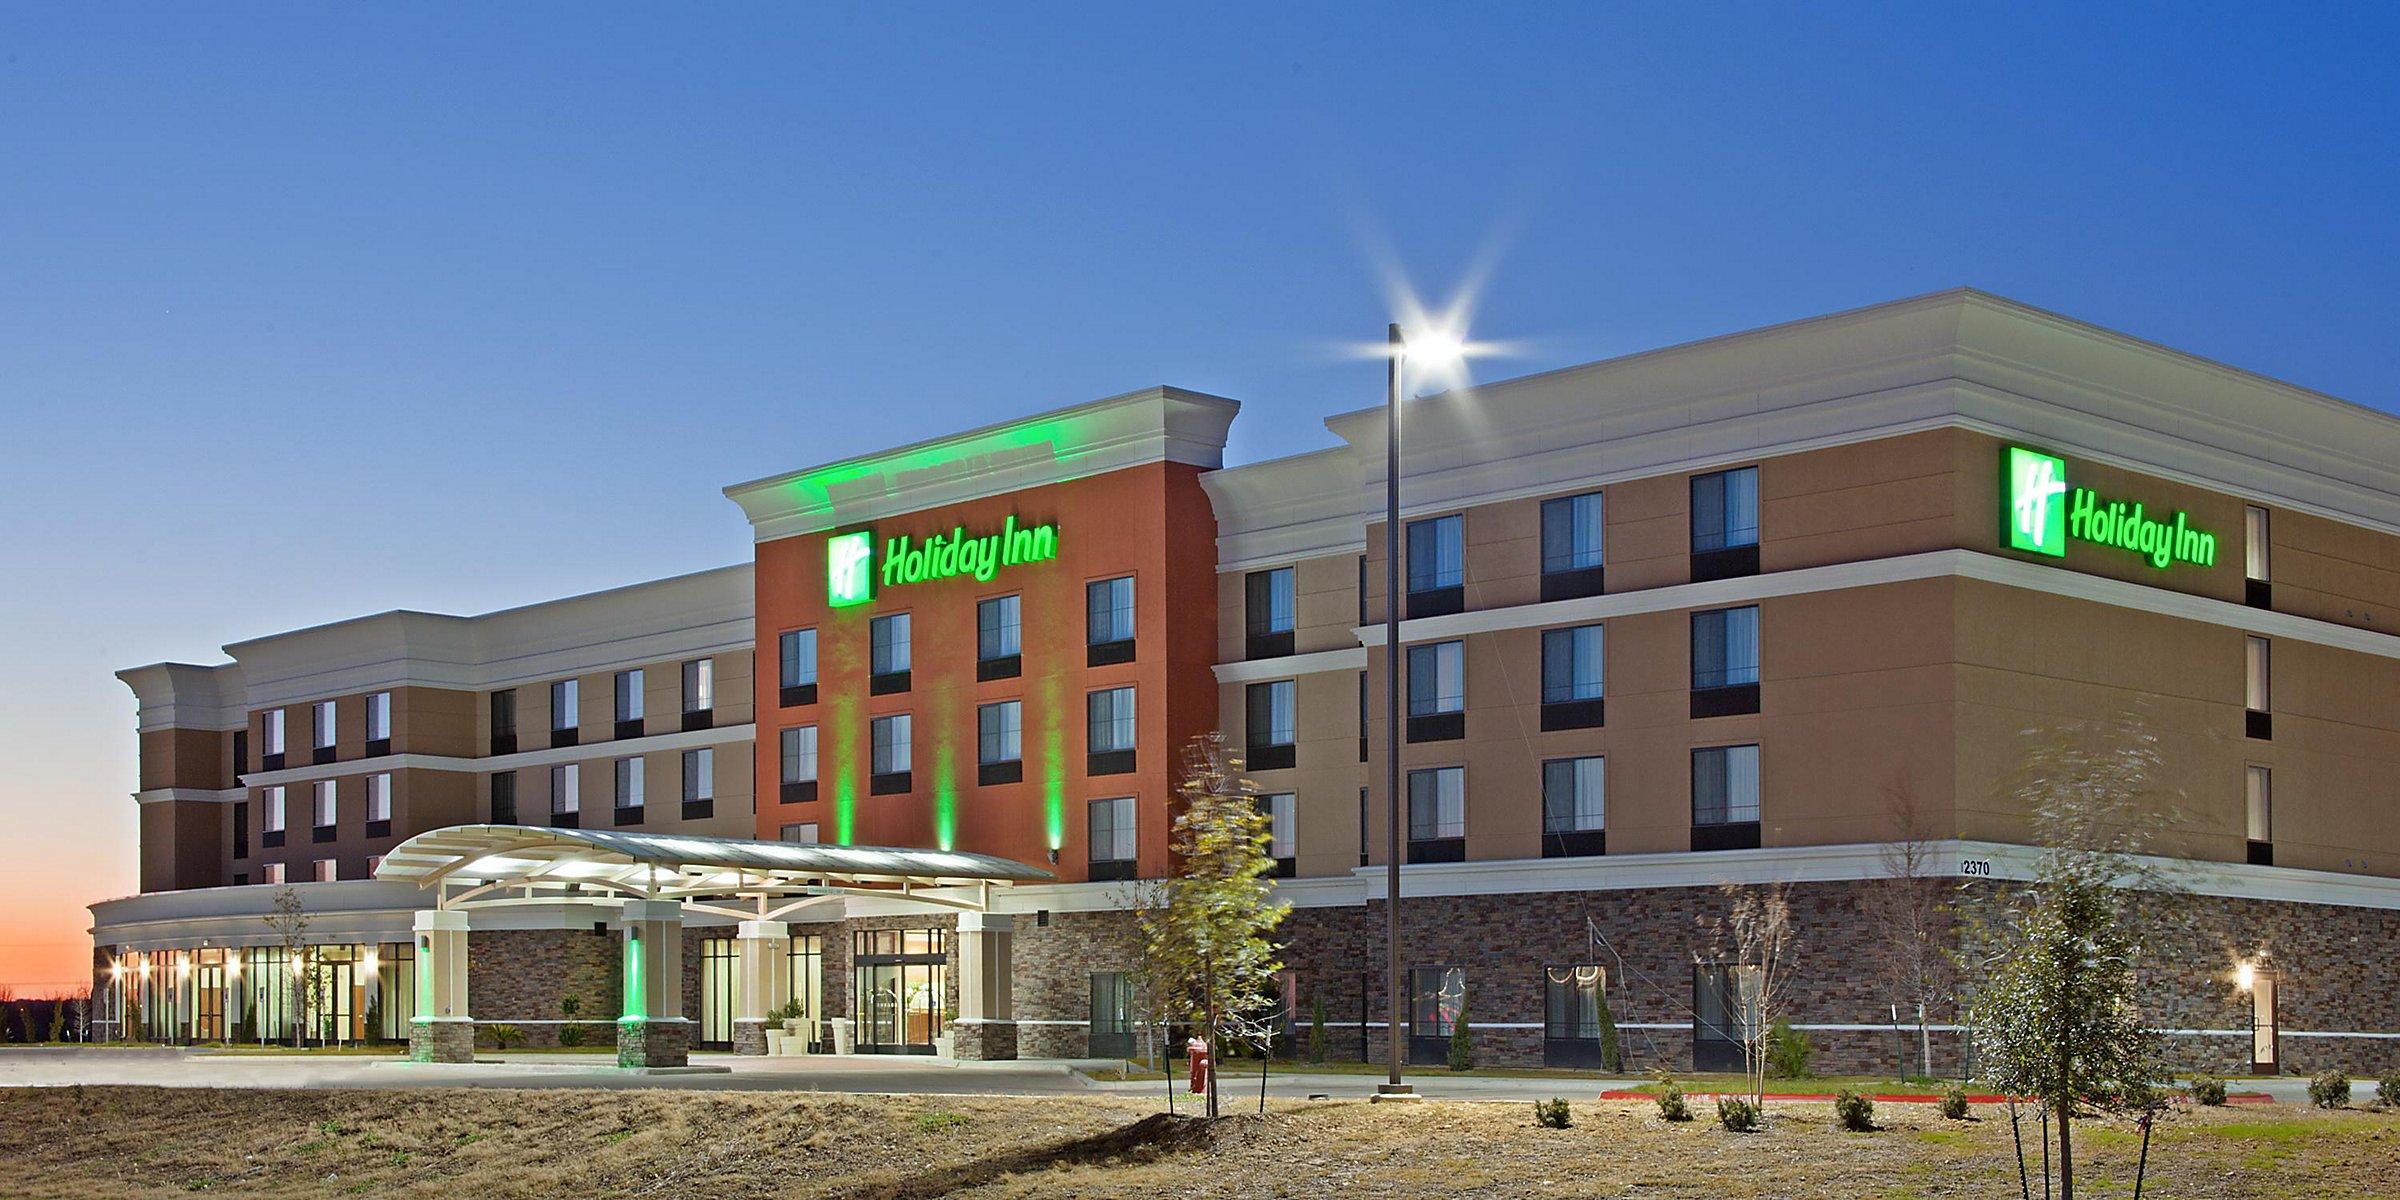 Holiday Inn Austin North - Round Rock Hotel by IHG